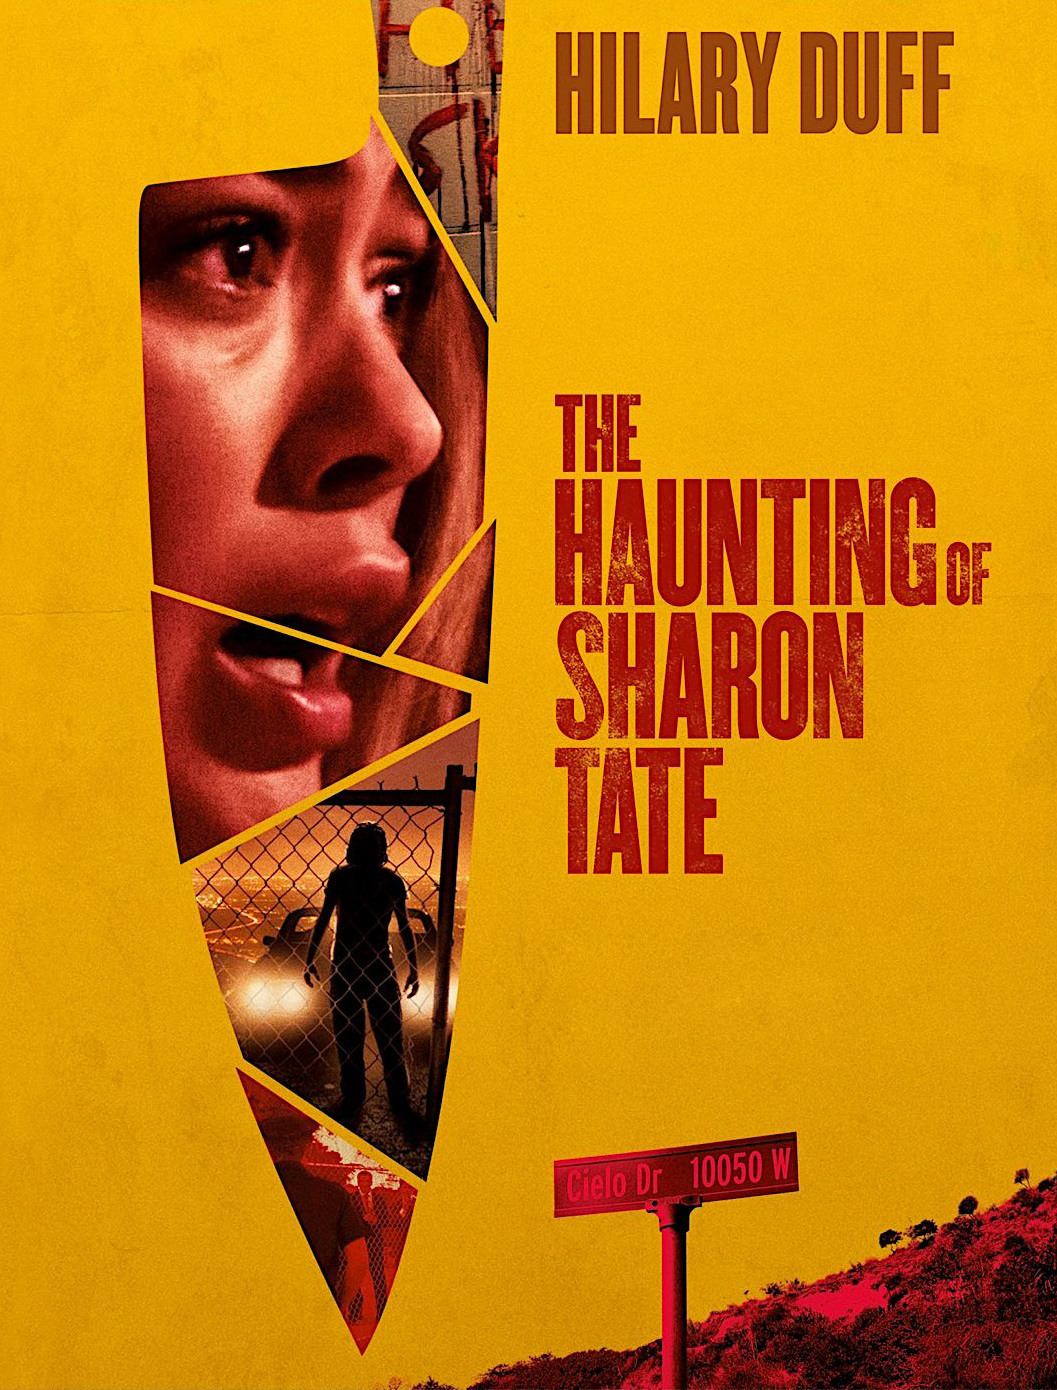 The Haunting of Sharon Tate [2019] [DVDR] [NTSC] [Latino]